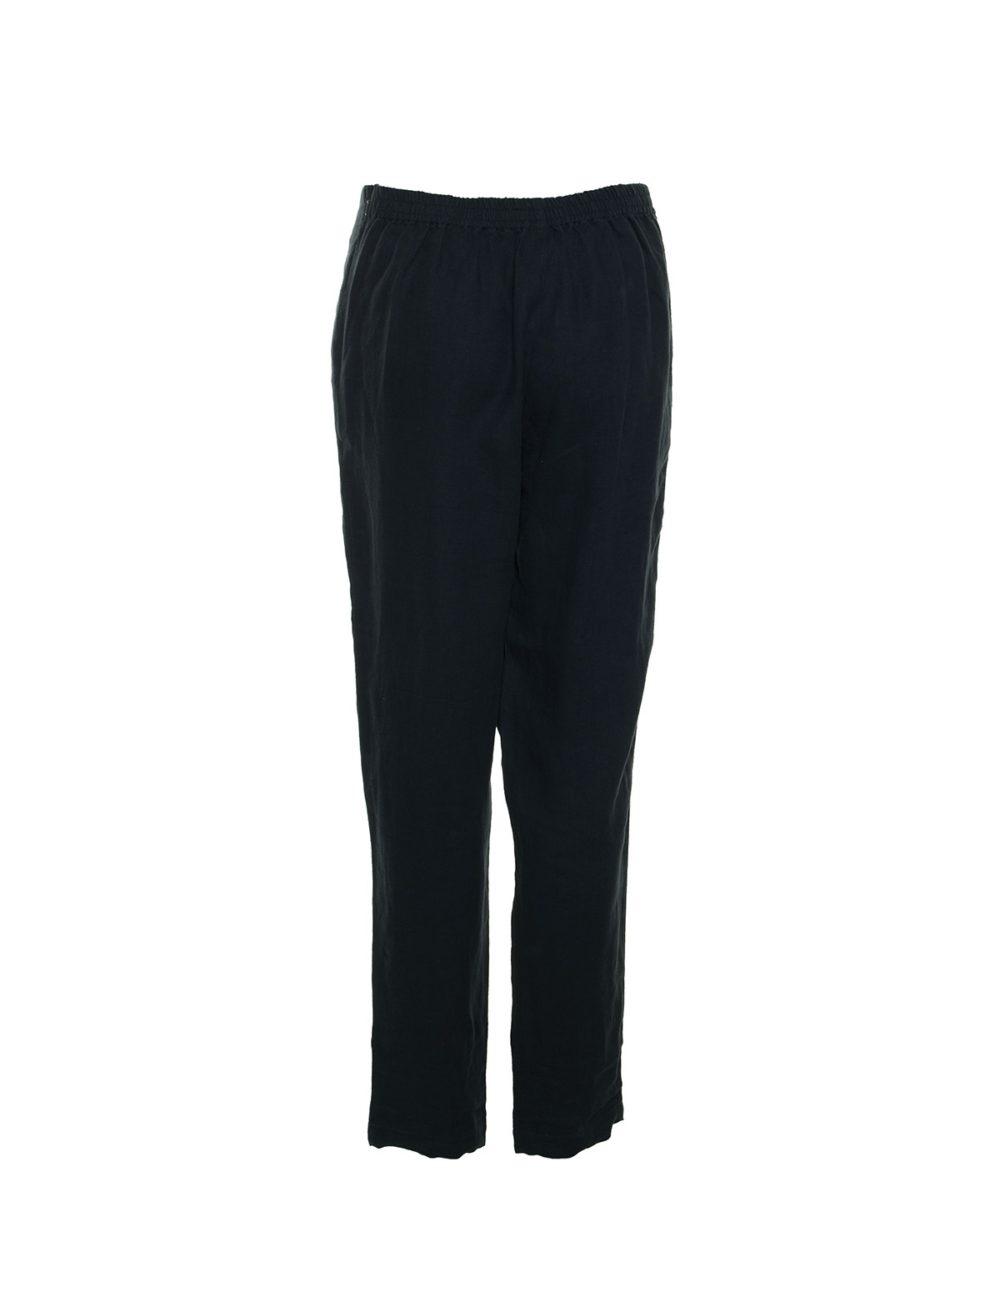 Slim Pants Kokomarina Katie Kerr Women's Clothing